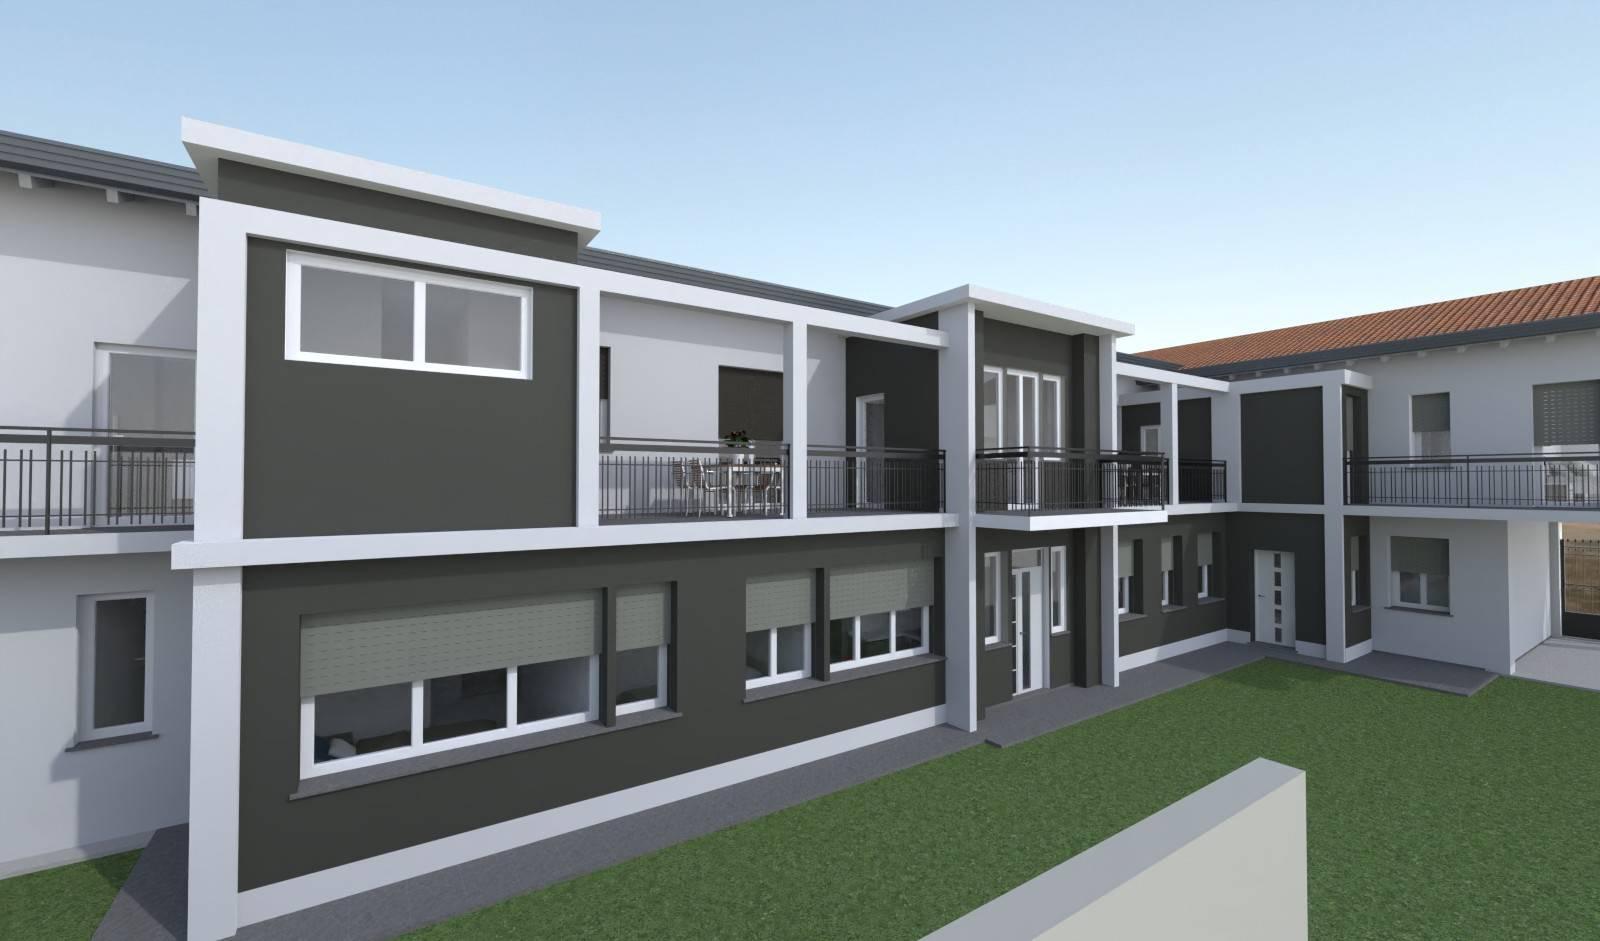 Vendita 5 Locali Appartamento Cislago 285276